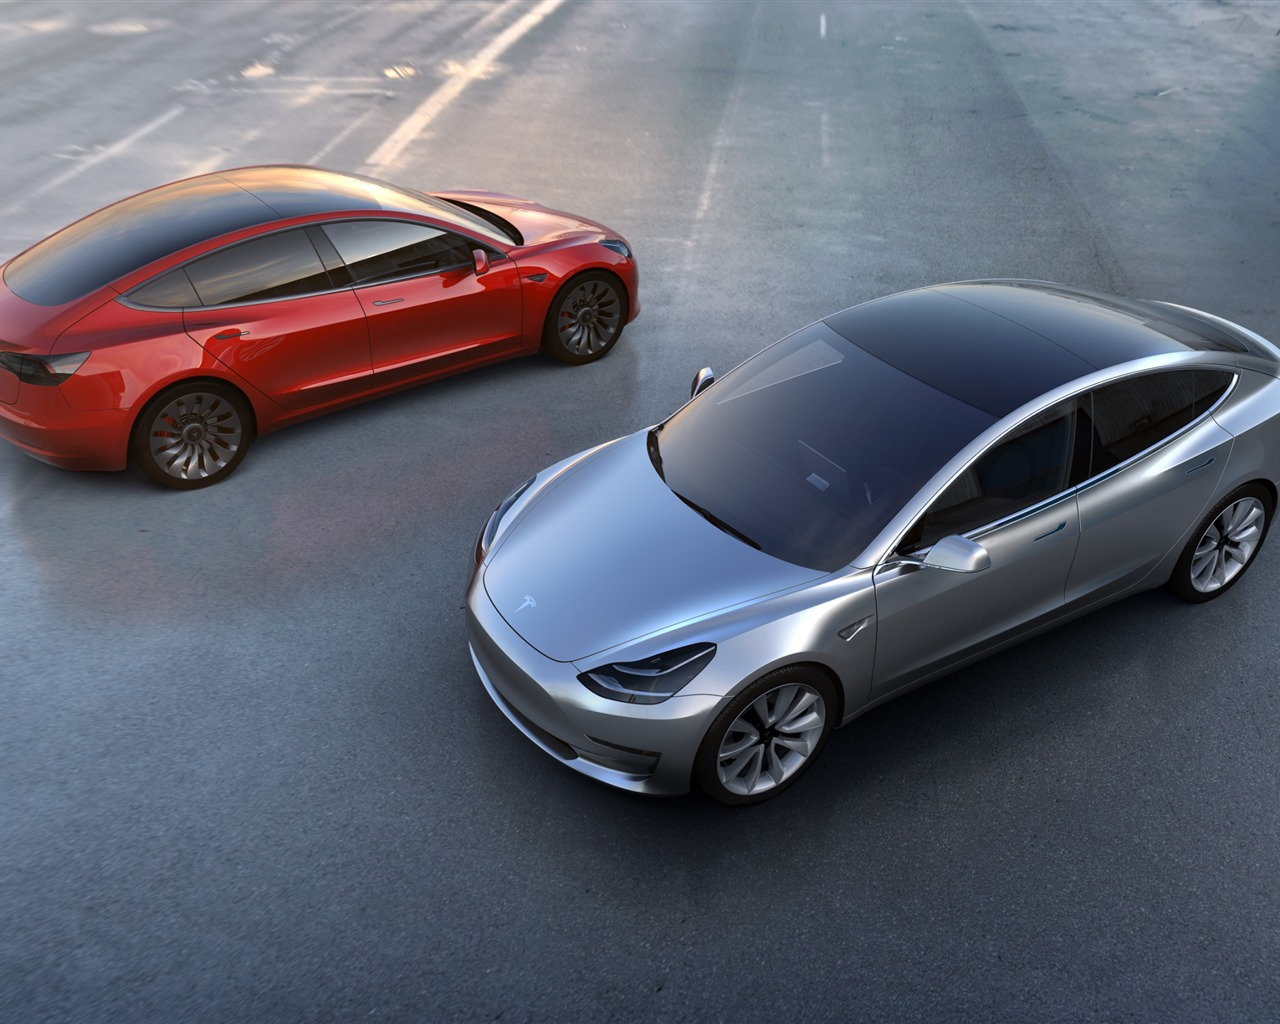 Tesla Model 3 豪华轿车高清壁纸预览 10wallpaper Com